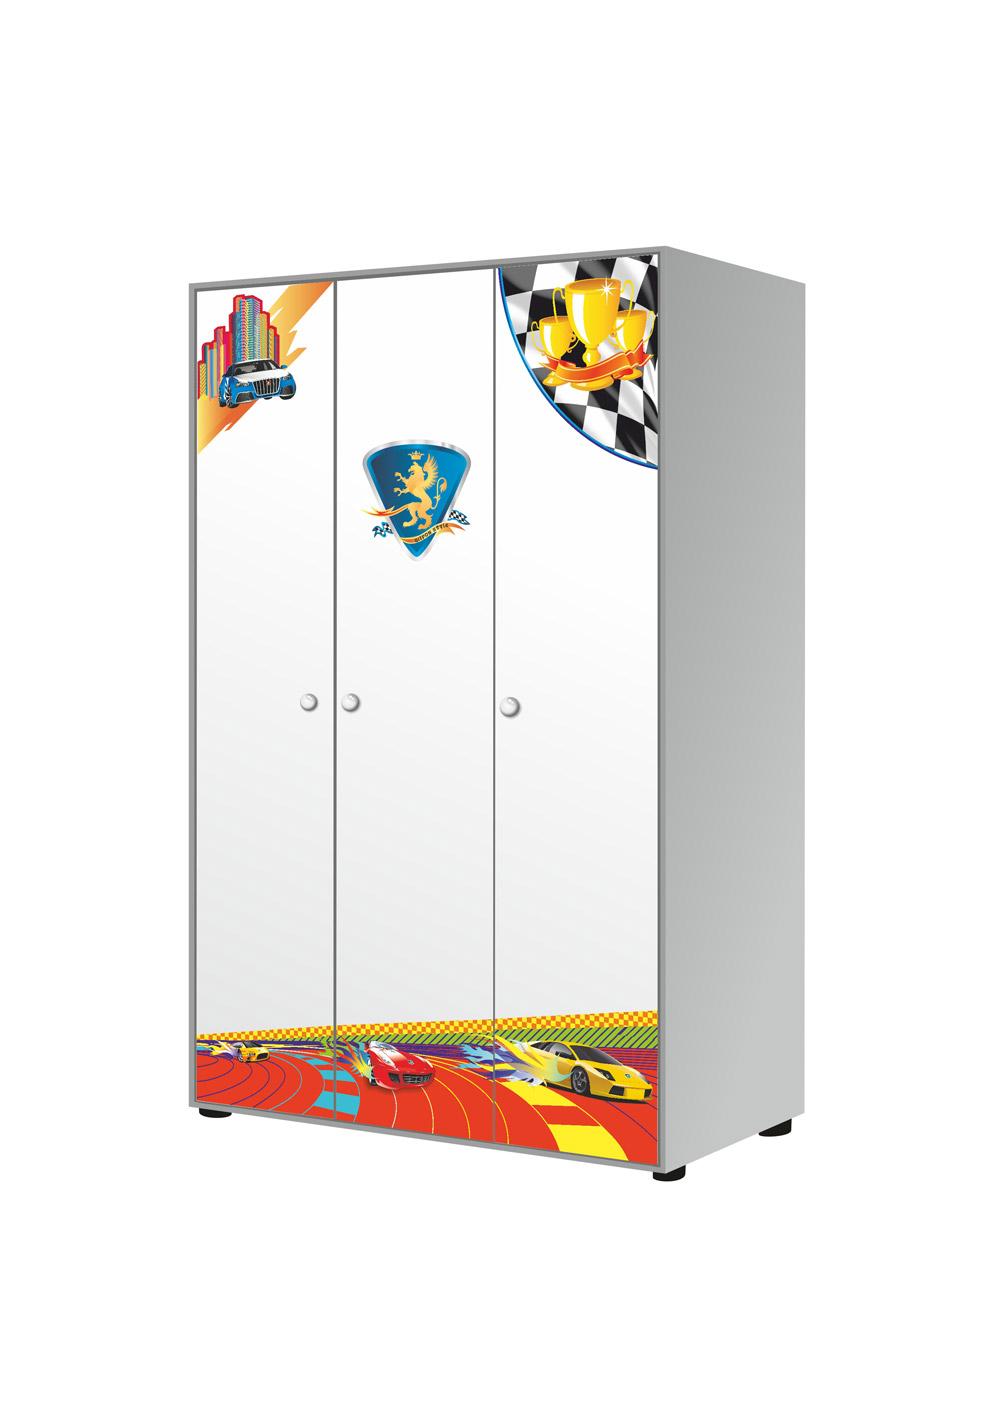 Шкафы и стеллажи Grifon Style RX800 ЛДСП Brilliantline